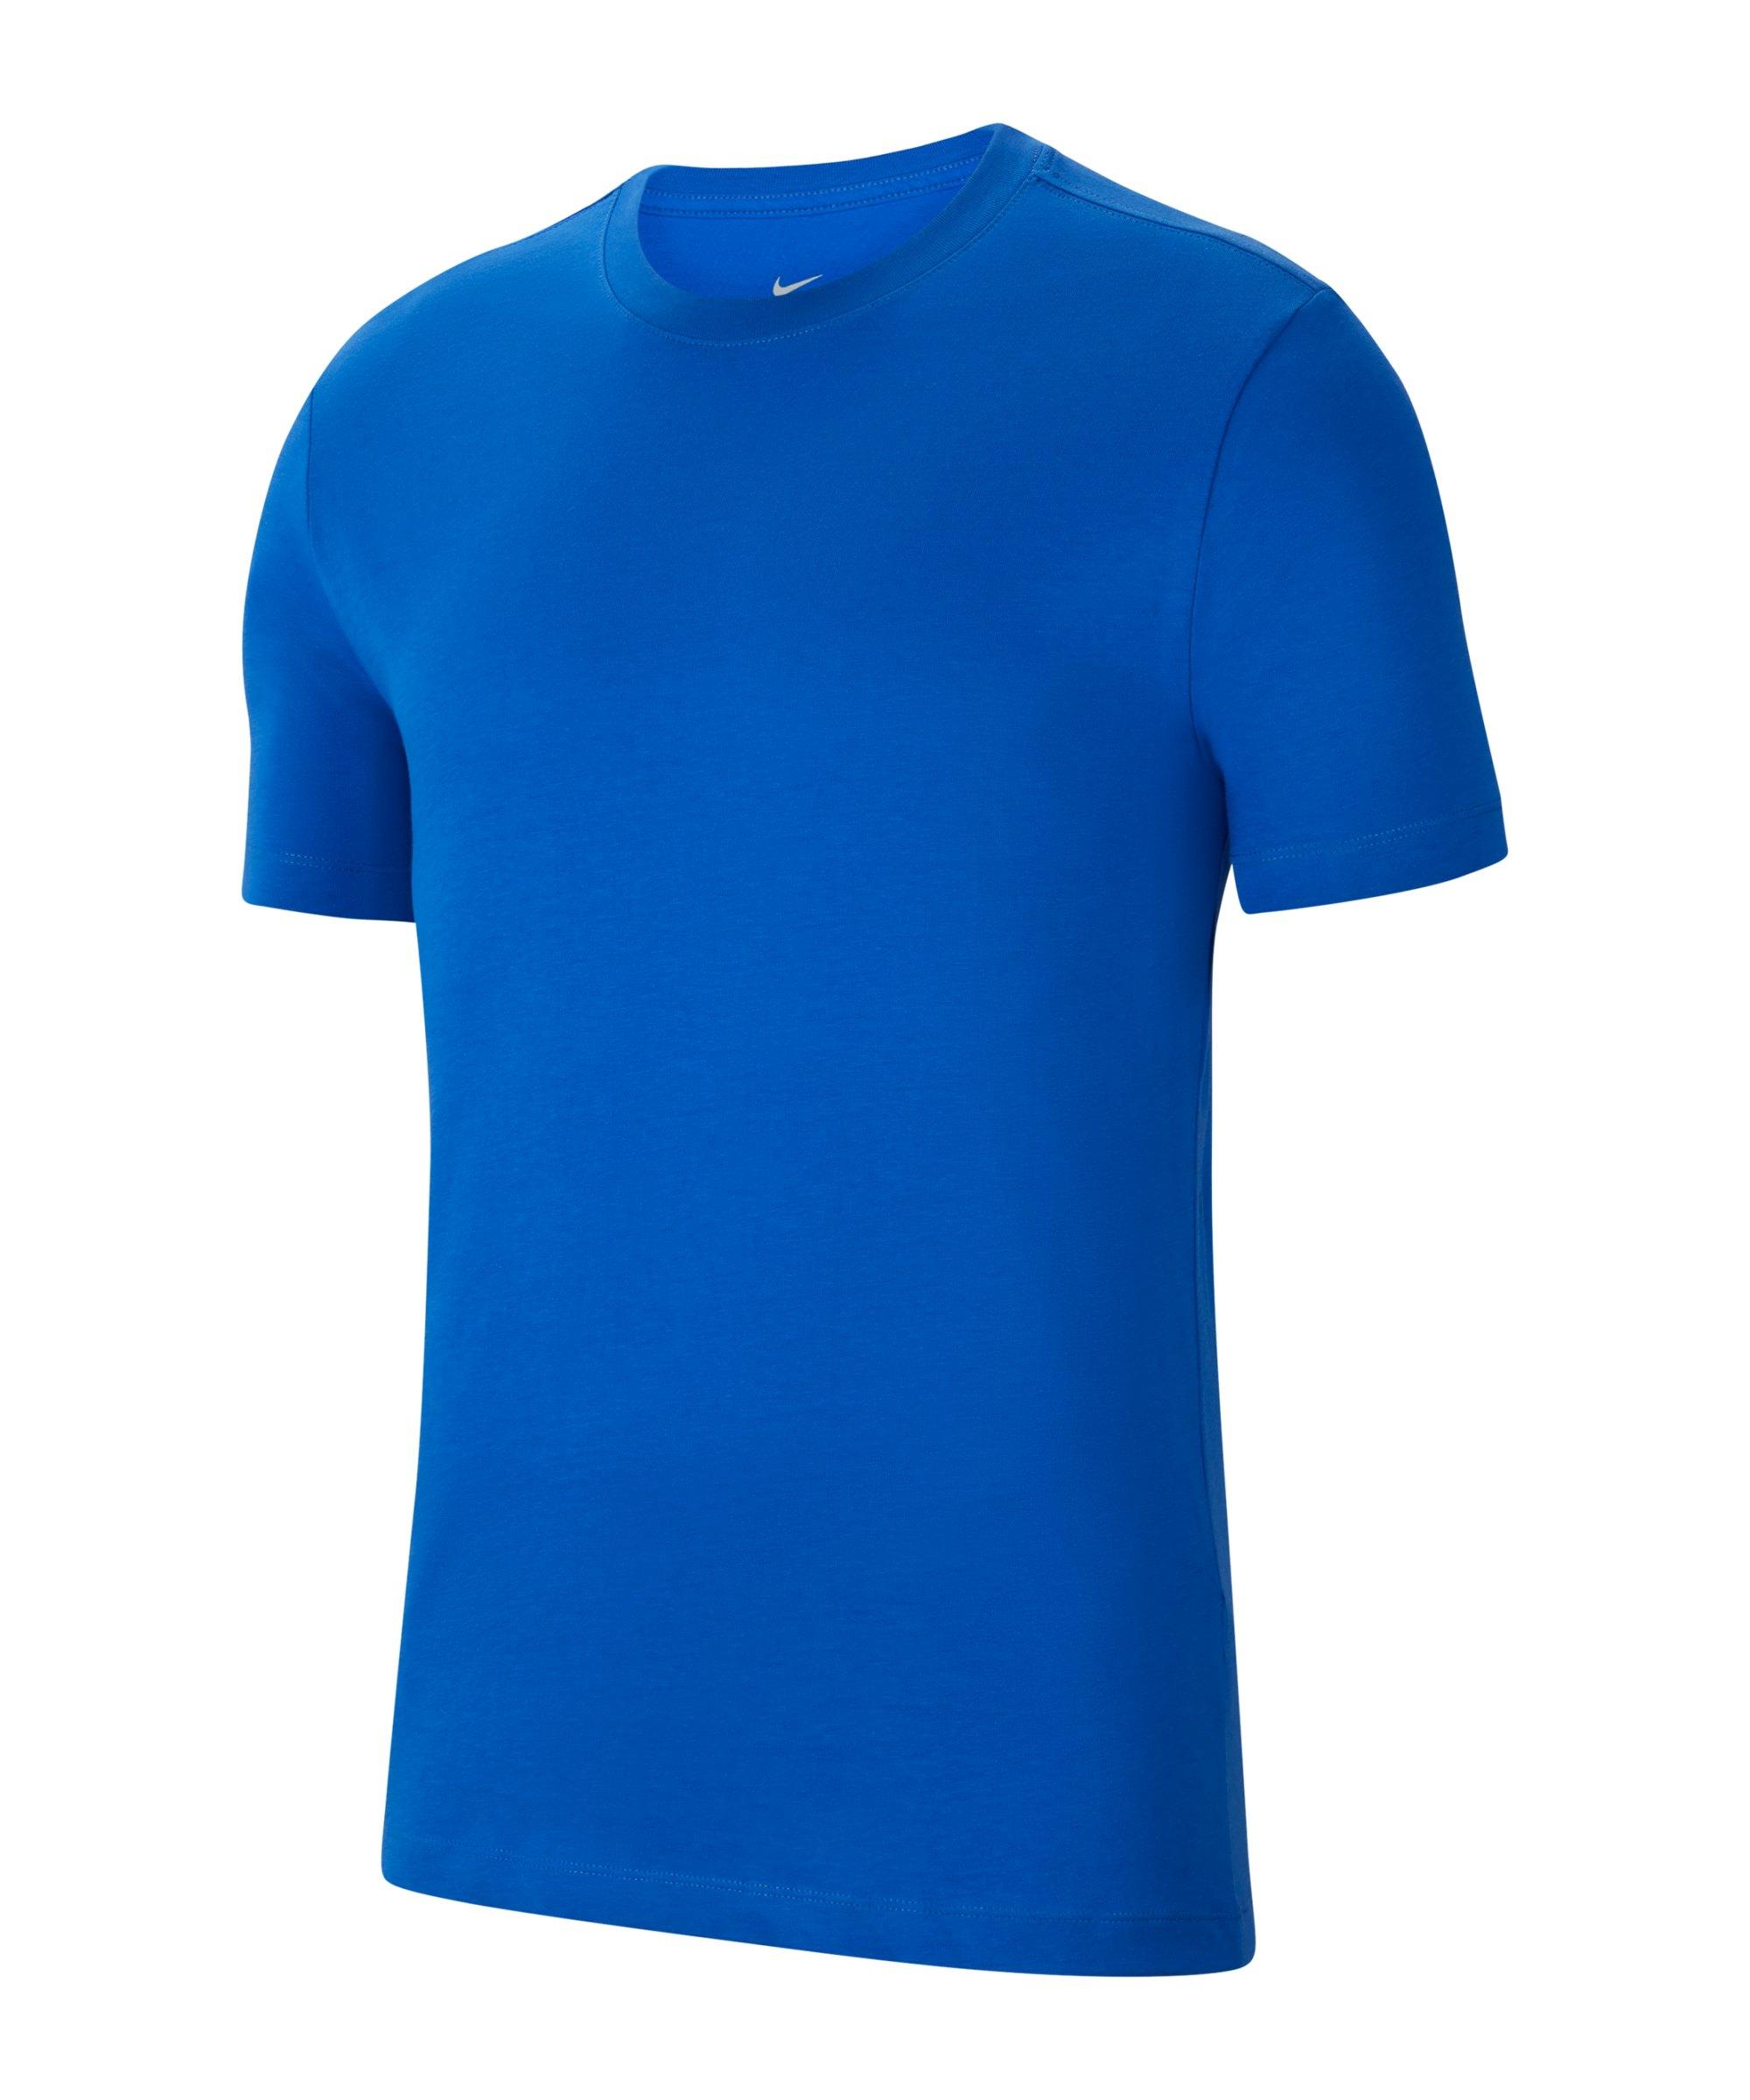 Nike Park 20 T-Shirt Blau Weiss F463 - blau